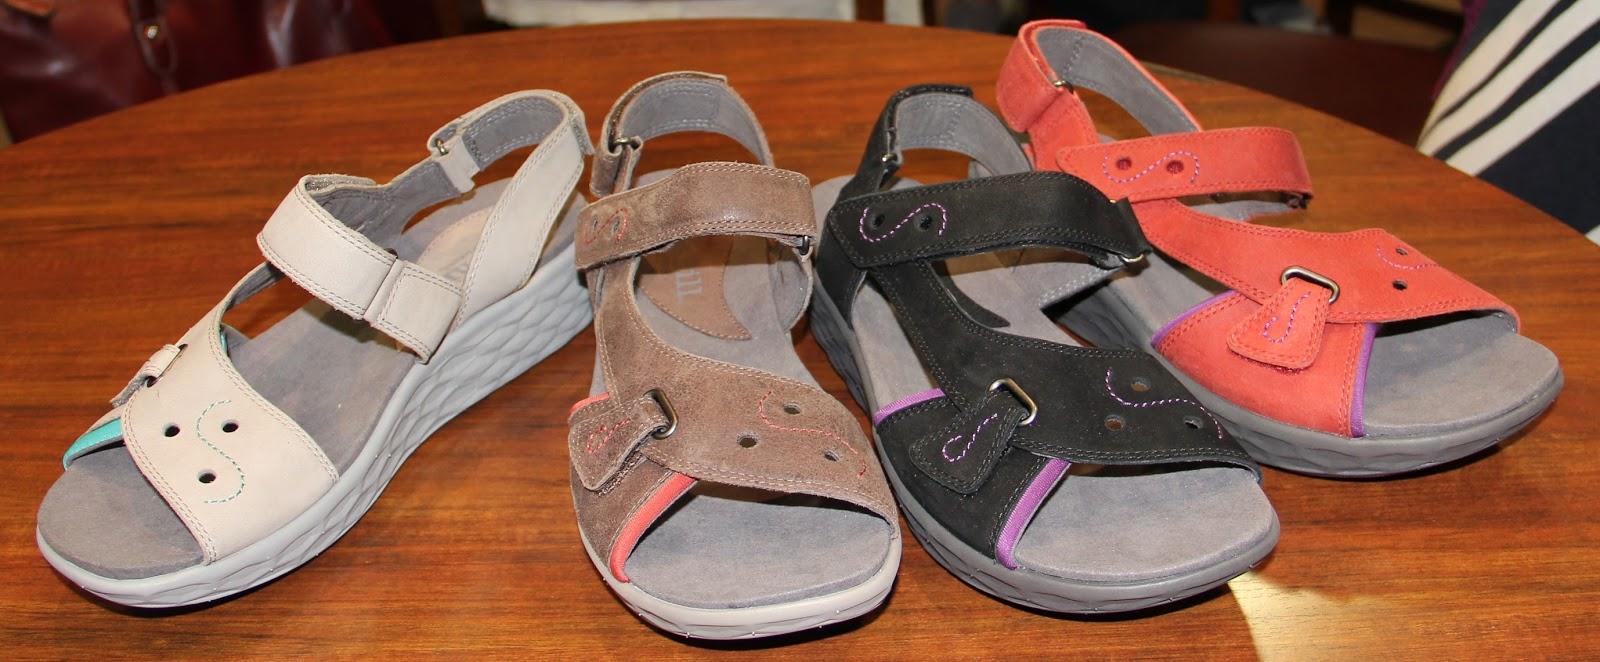 featuring Fresh Foam by New Balance tech---FreshStar sport sandal has wedge  1 ⅞